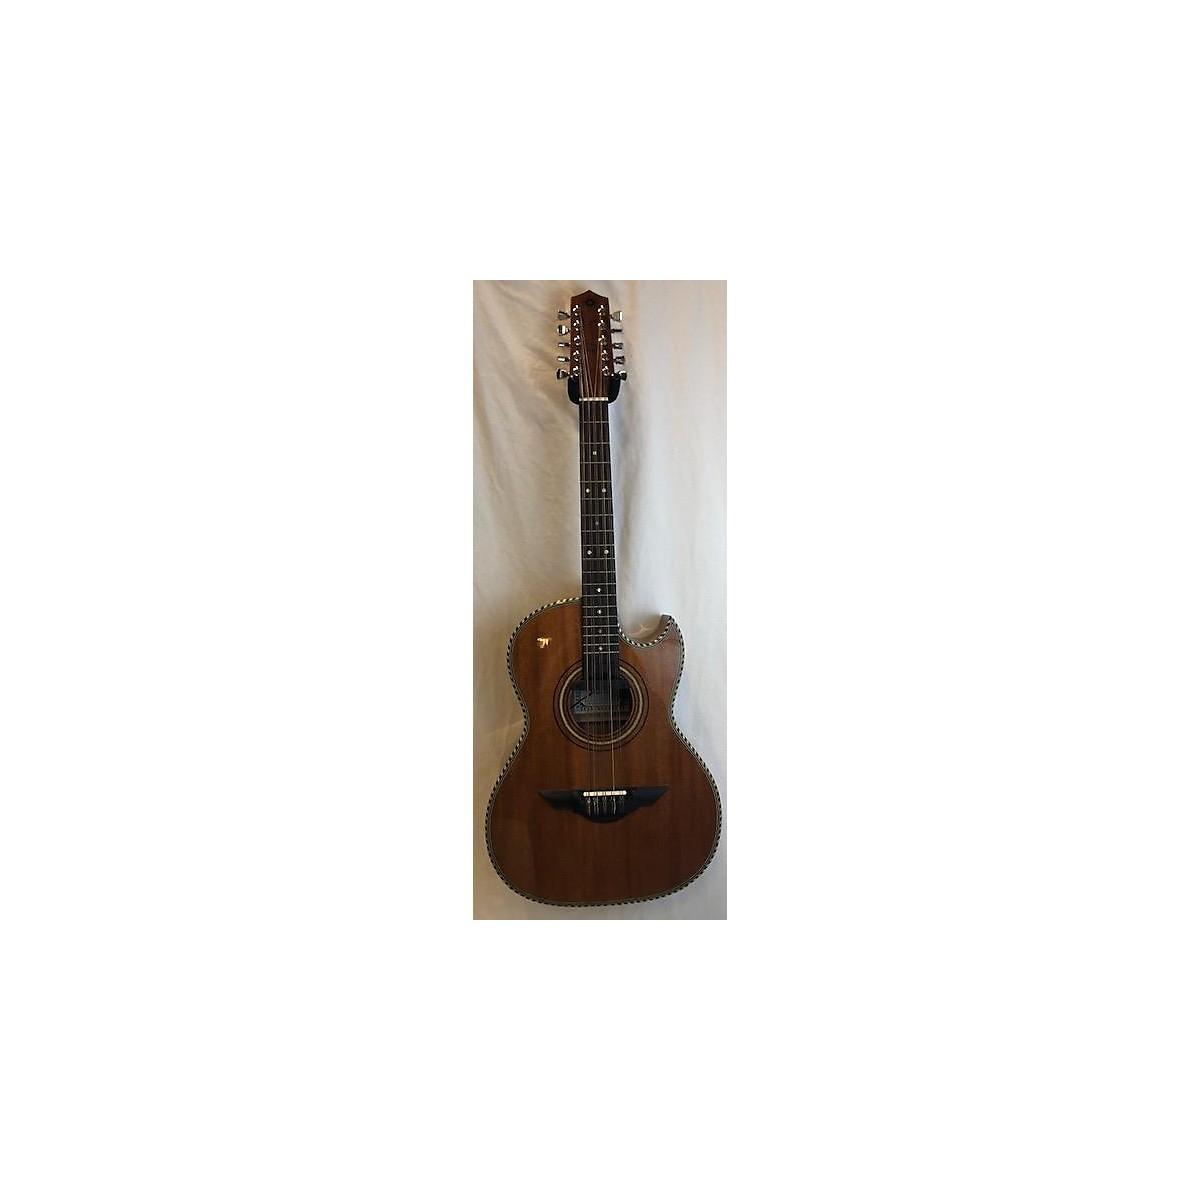 H. Jimenez LBQ1ENM 12 String Acoustic Electric Guitar